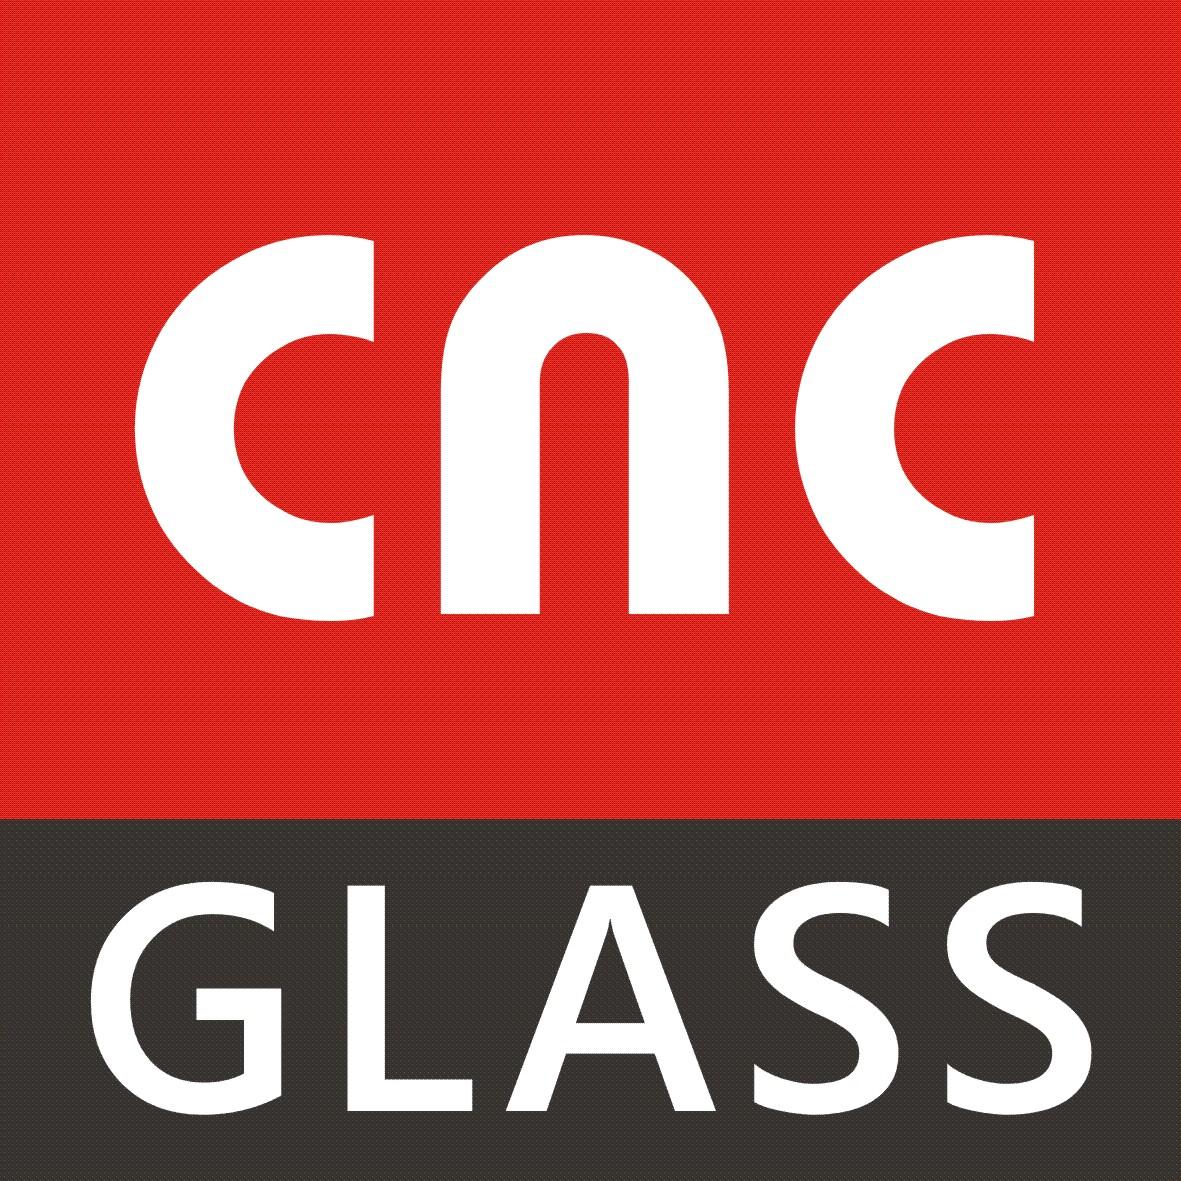 cnc-glass-interlayer